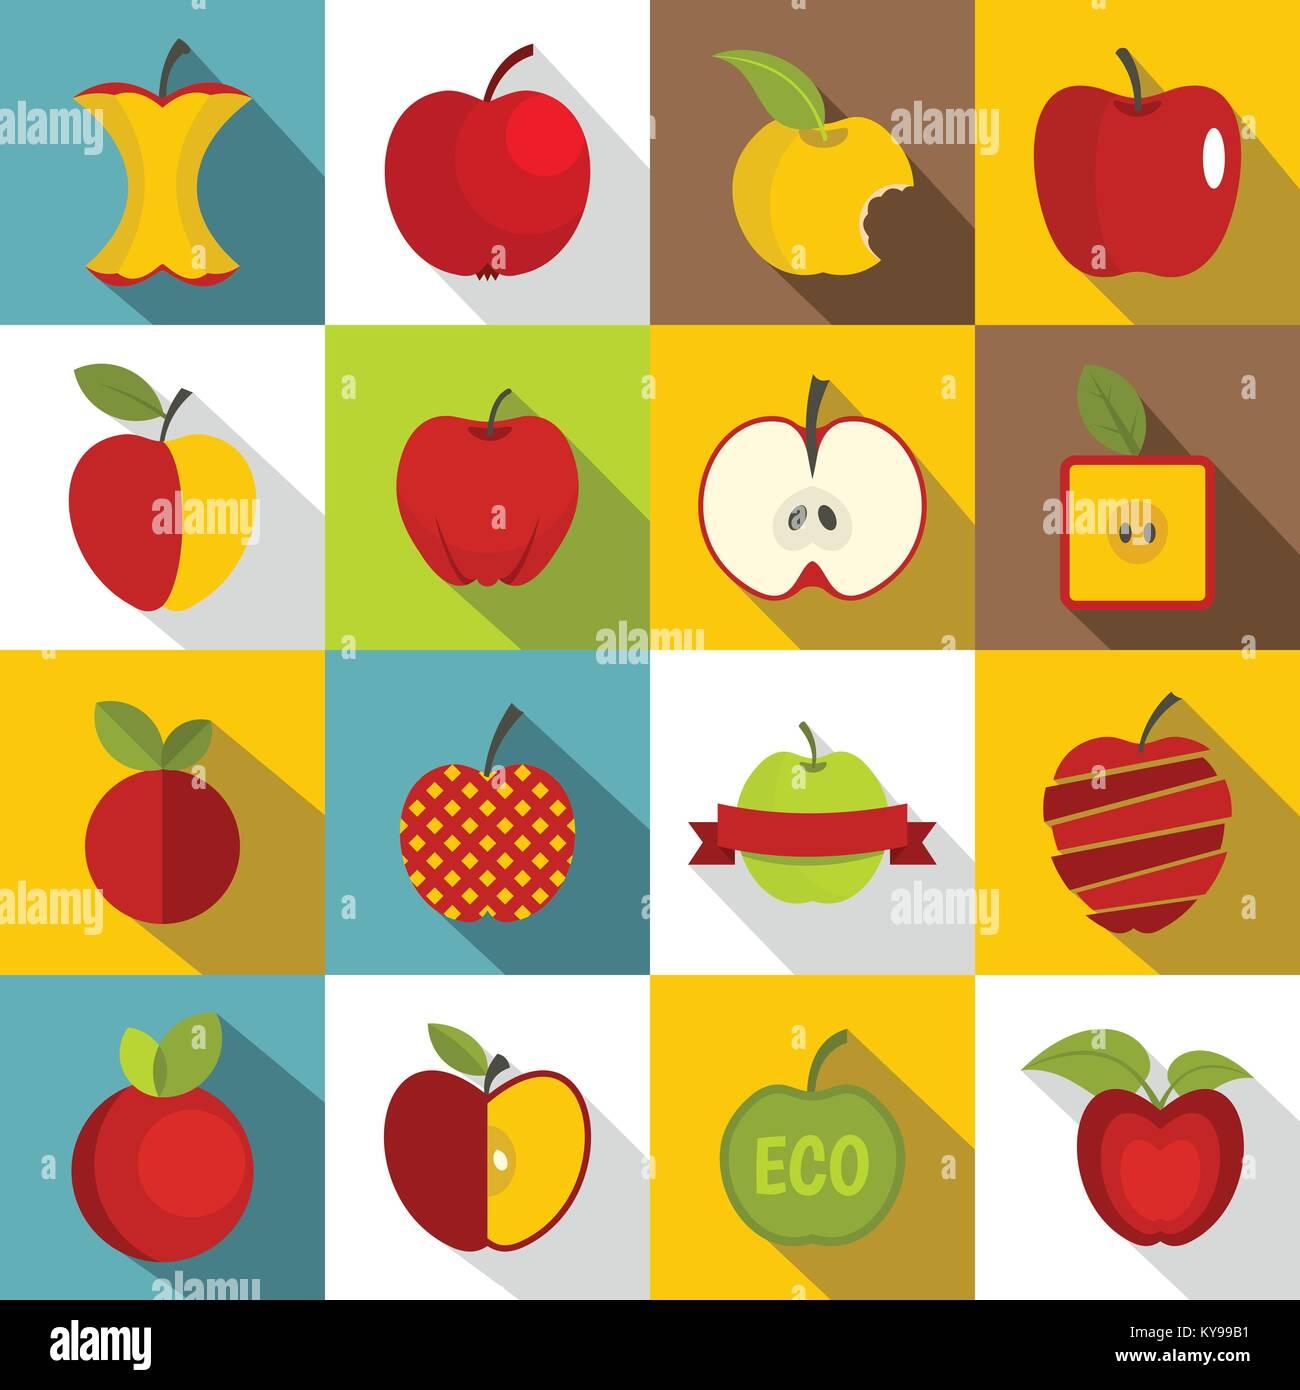 Apple icons set design logo  Flat illustration of 16 apple design